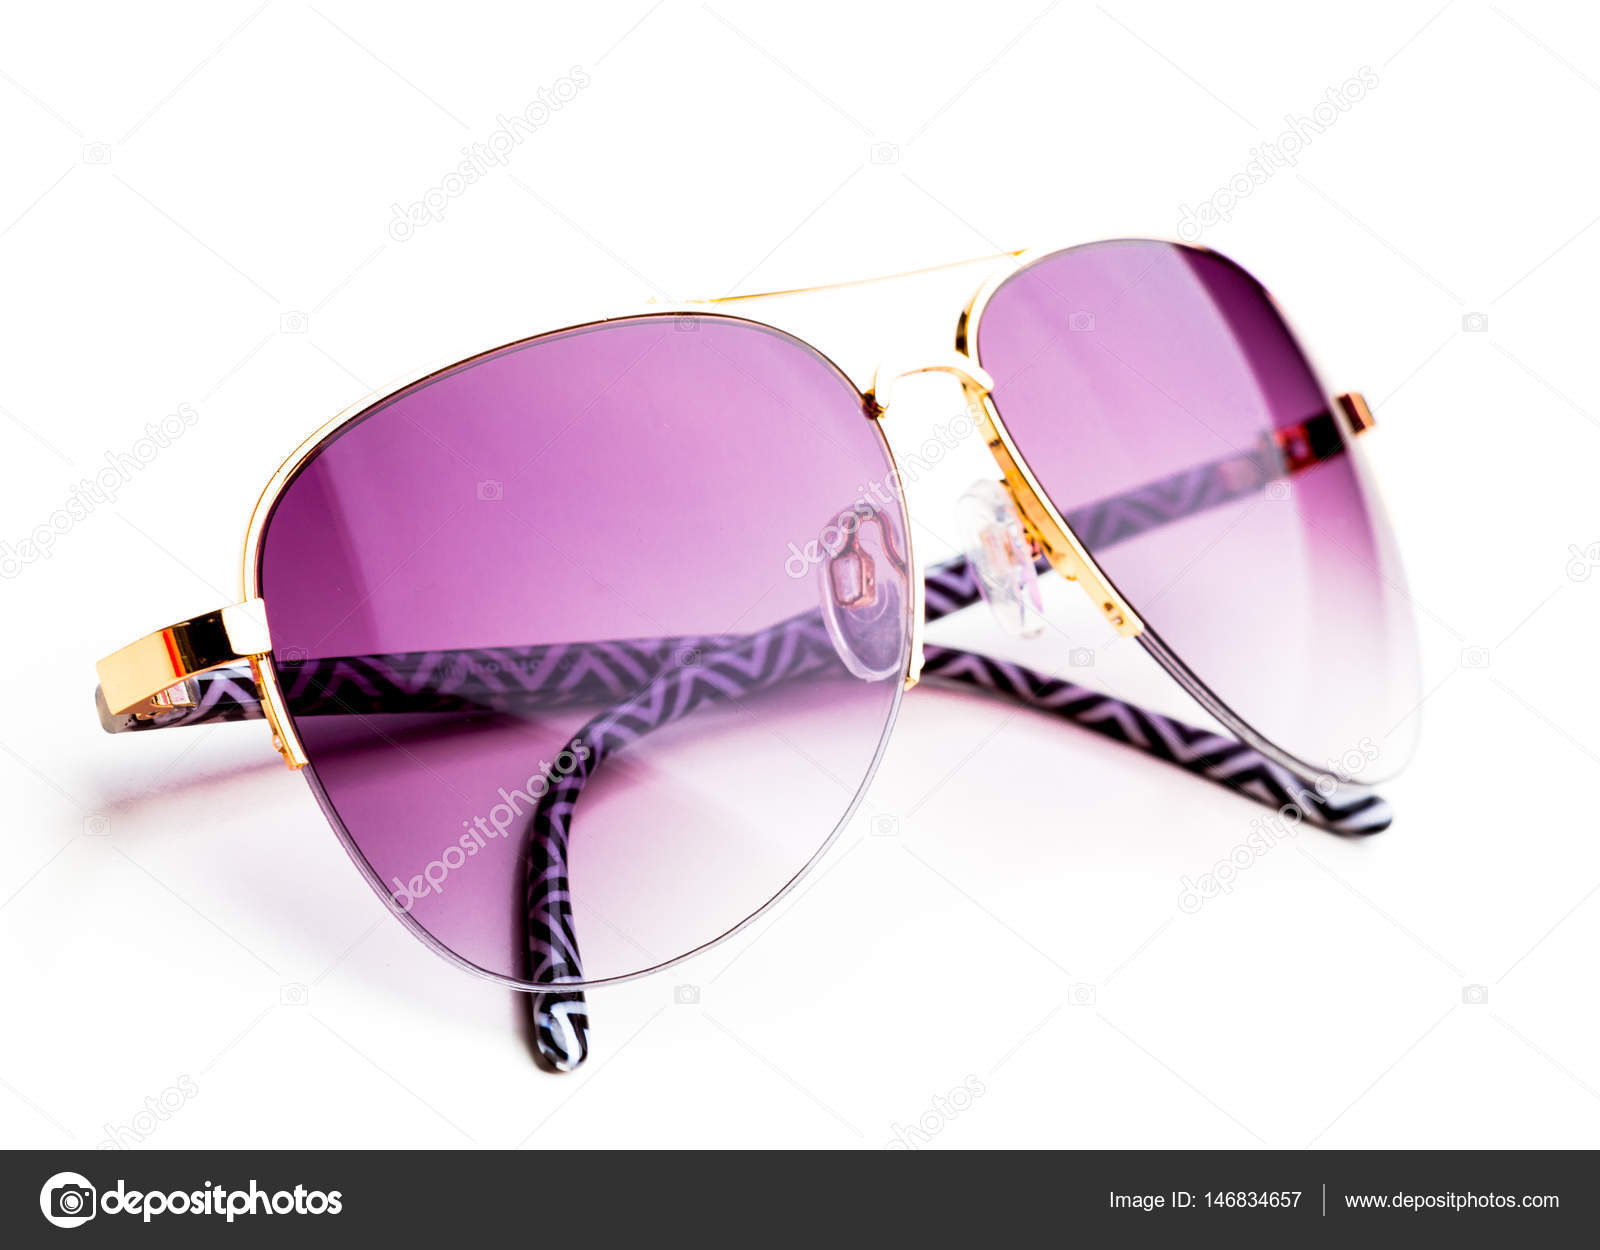 66bbb3deea Σύγχρονη μοντέρνα γυαλιά ηλίου που απομονώνονται σε λευκό φόντο — Εικόνα  από ...